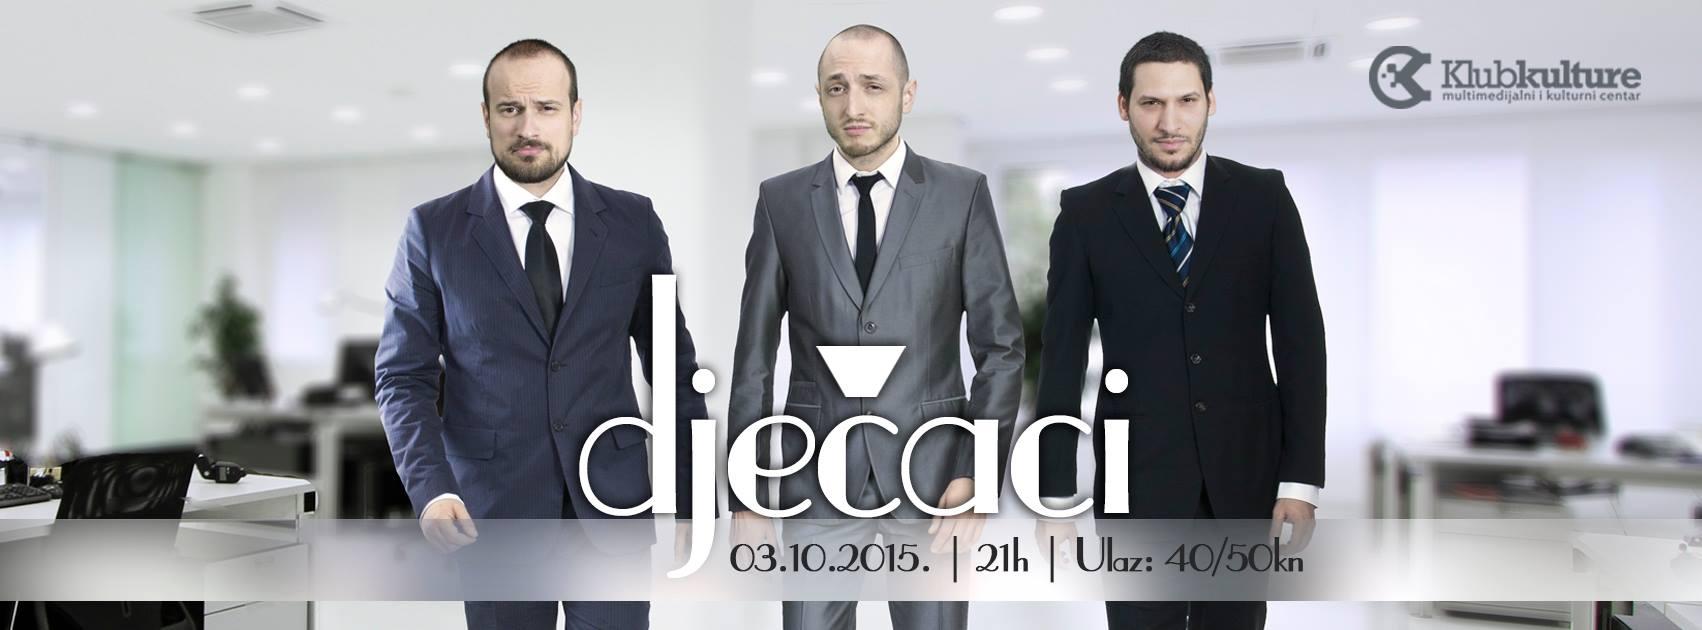 Djecaci_koncert_Klub_kulture_2015_cover